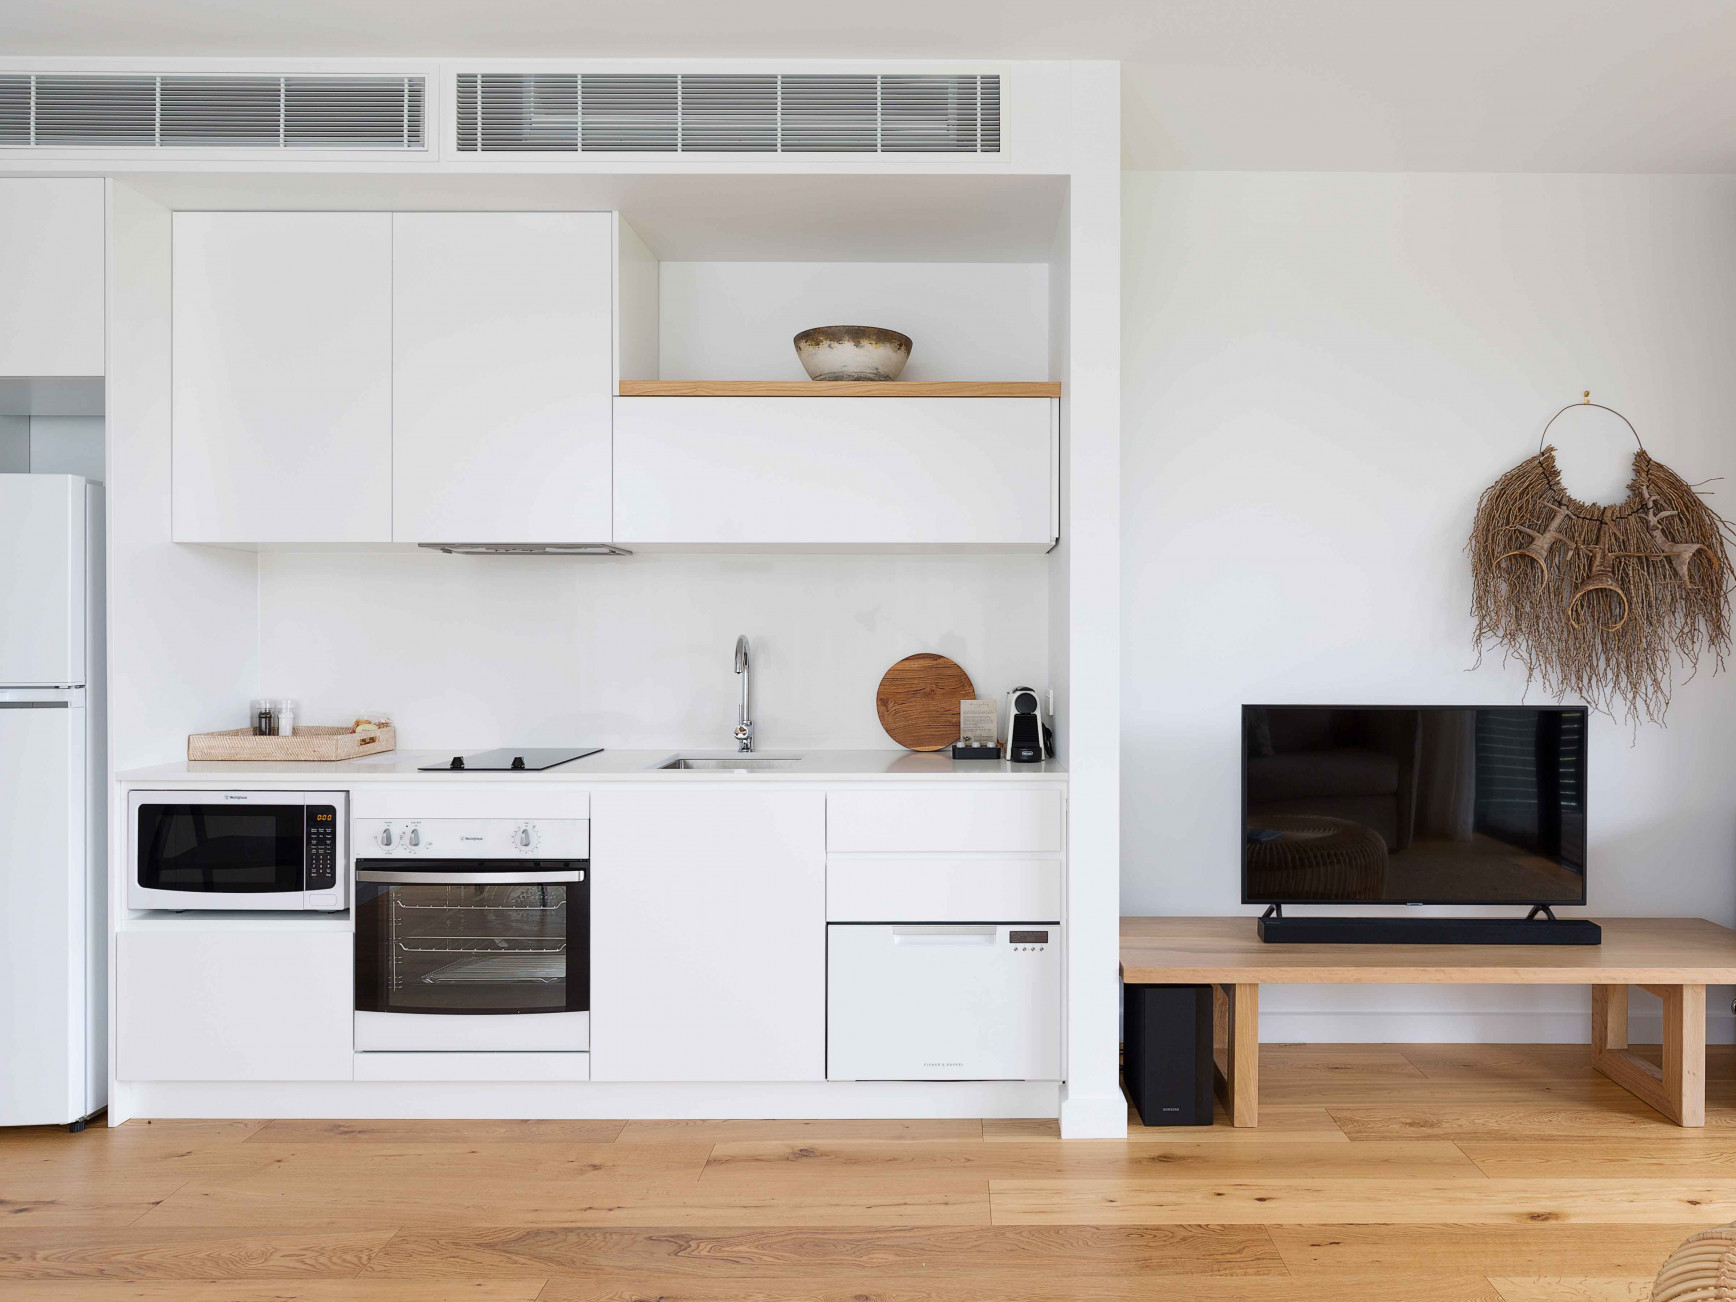 Mr And Mrs Smith Kitchen bangalay luxury villas, shoalhaven, australia